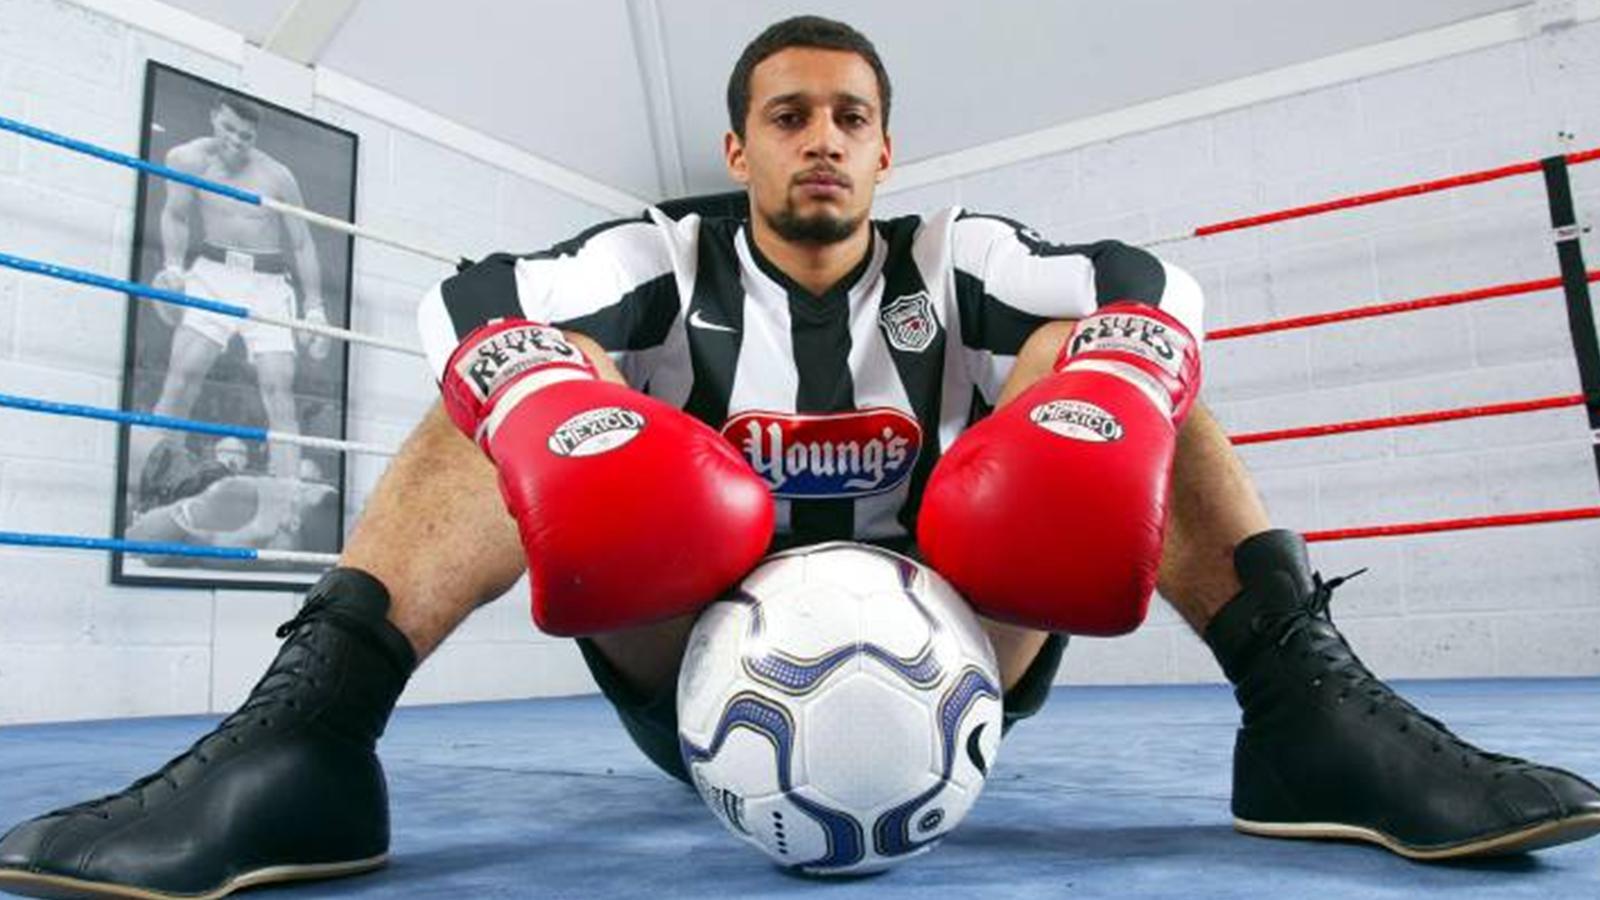 ex-footballer wins belt - boxing